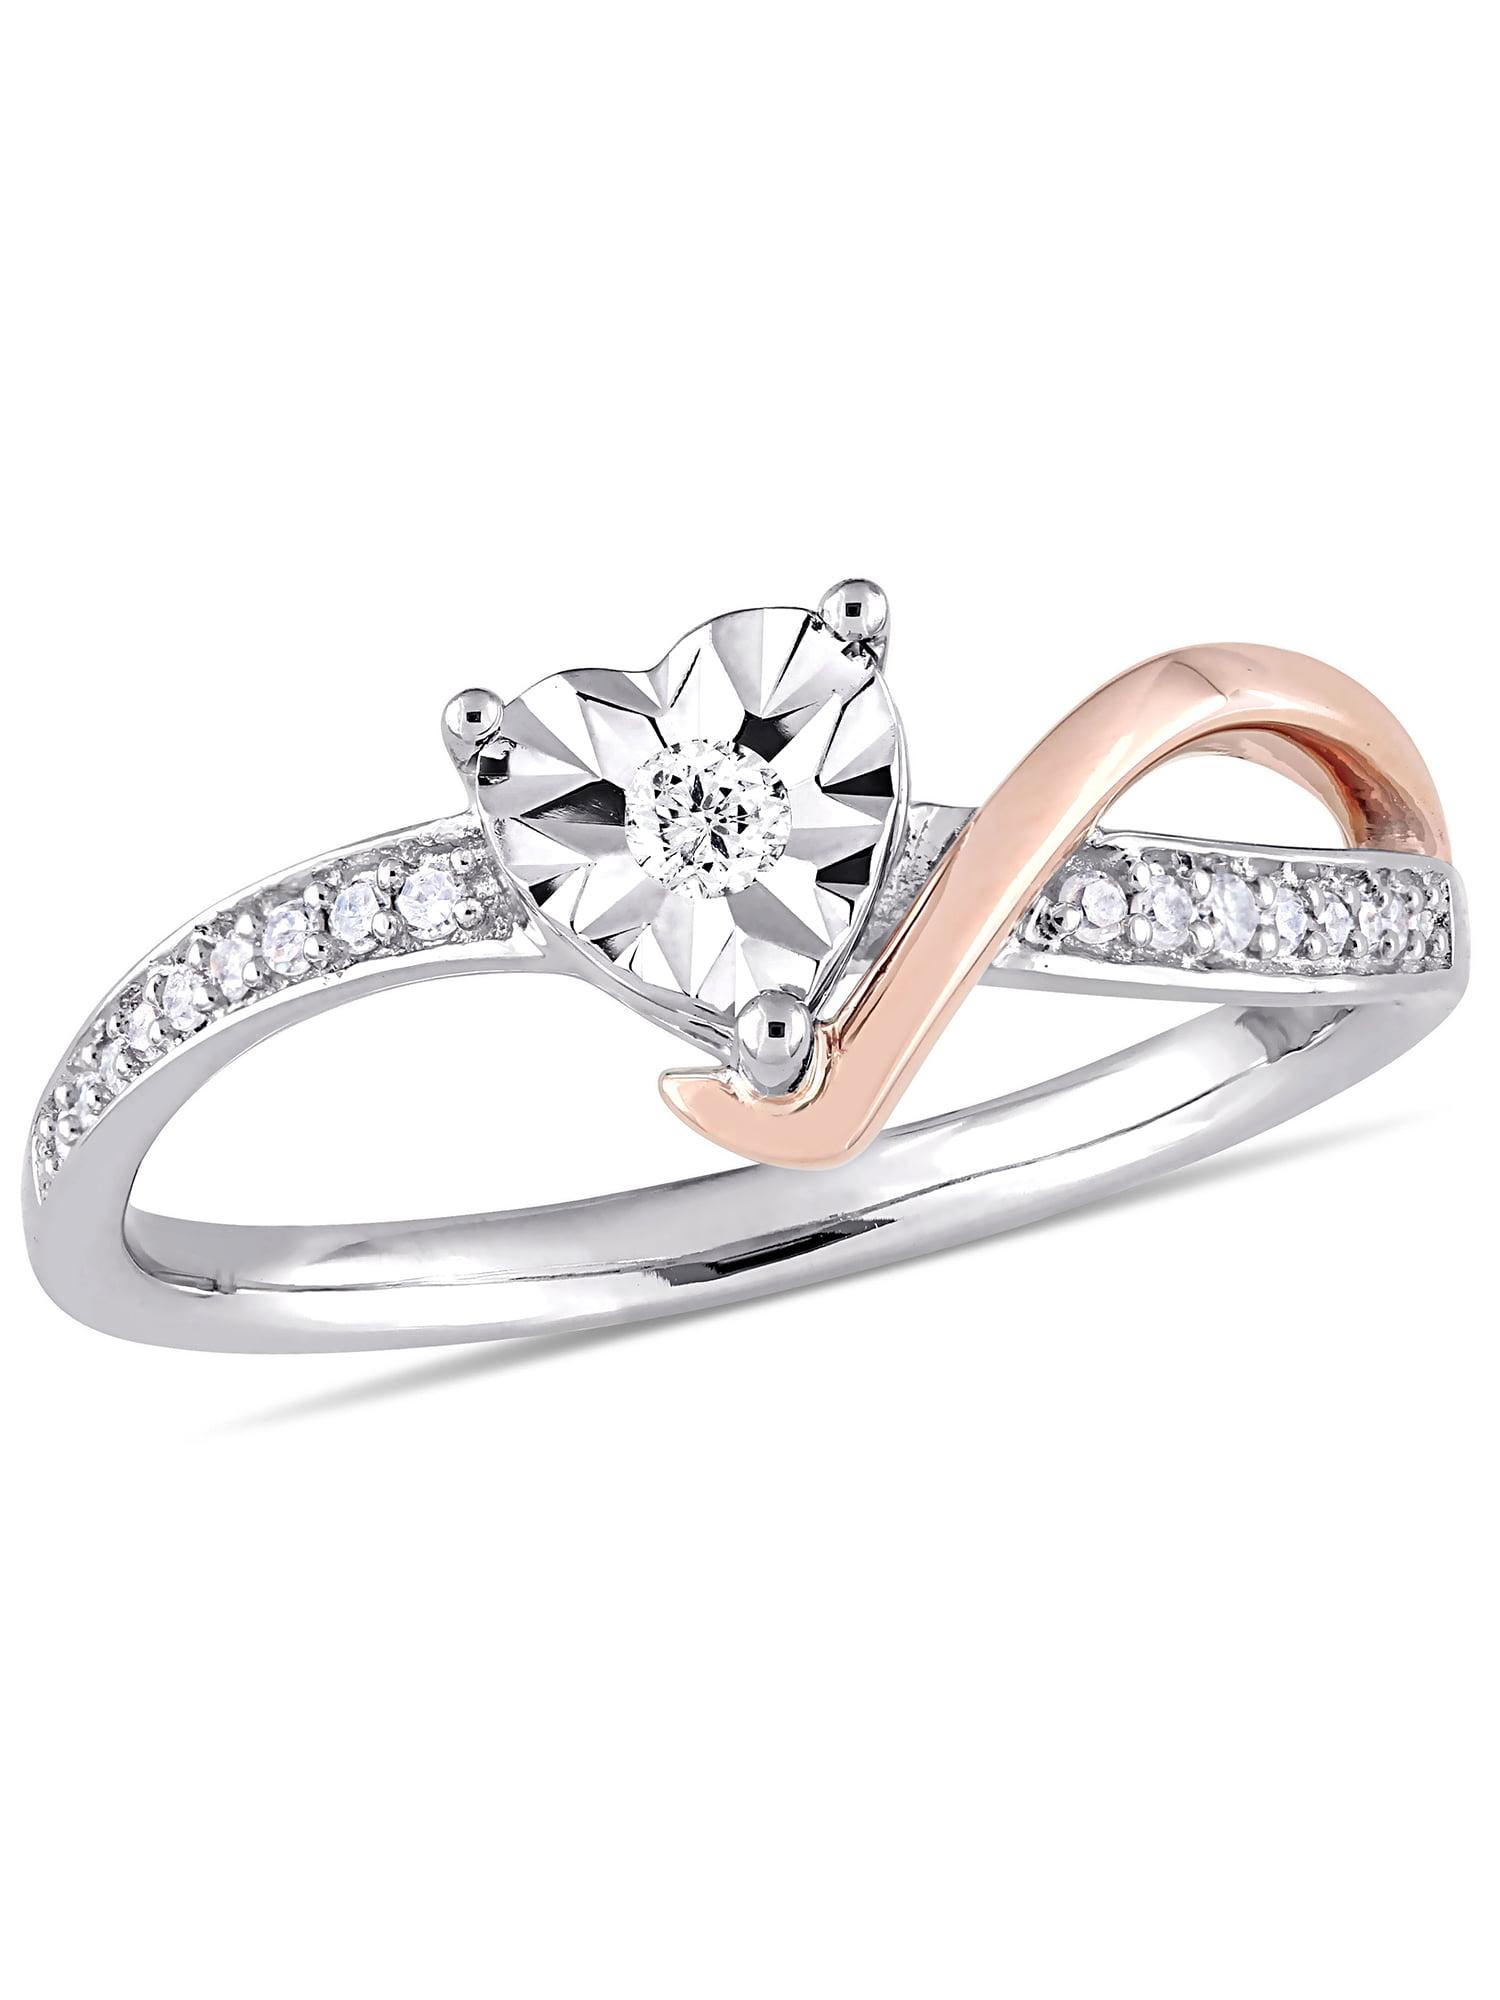 1/10 Carat Diamond 10kt Two-Tone Gold Heart Swirl Promise Ring